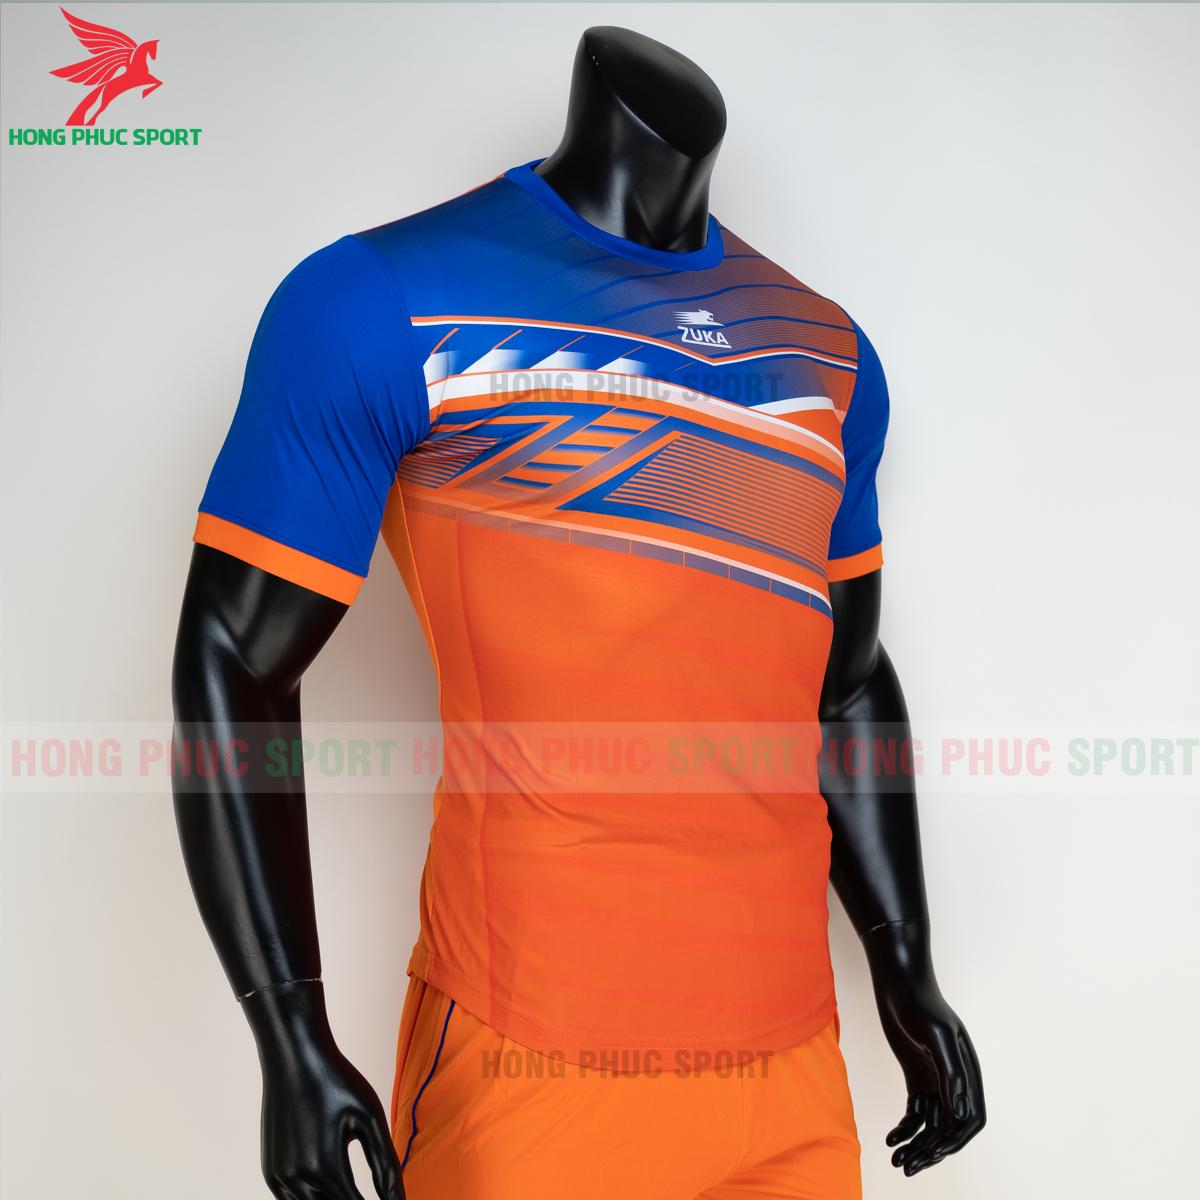 https://cdn.hongphucsport.com/unsafe/s4.shopbay.vn/files/285/ao-bong-da-khong-logo-zuka-01-mau-cam-5-60502bc34c862.png